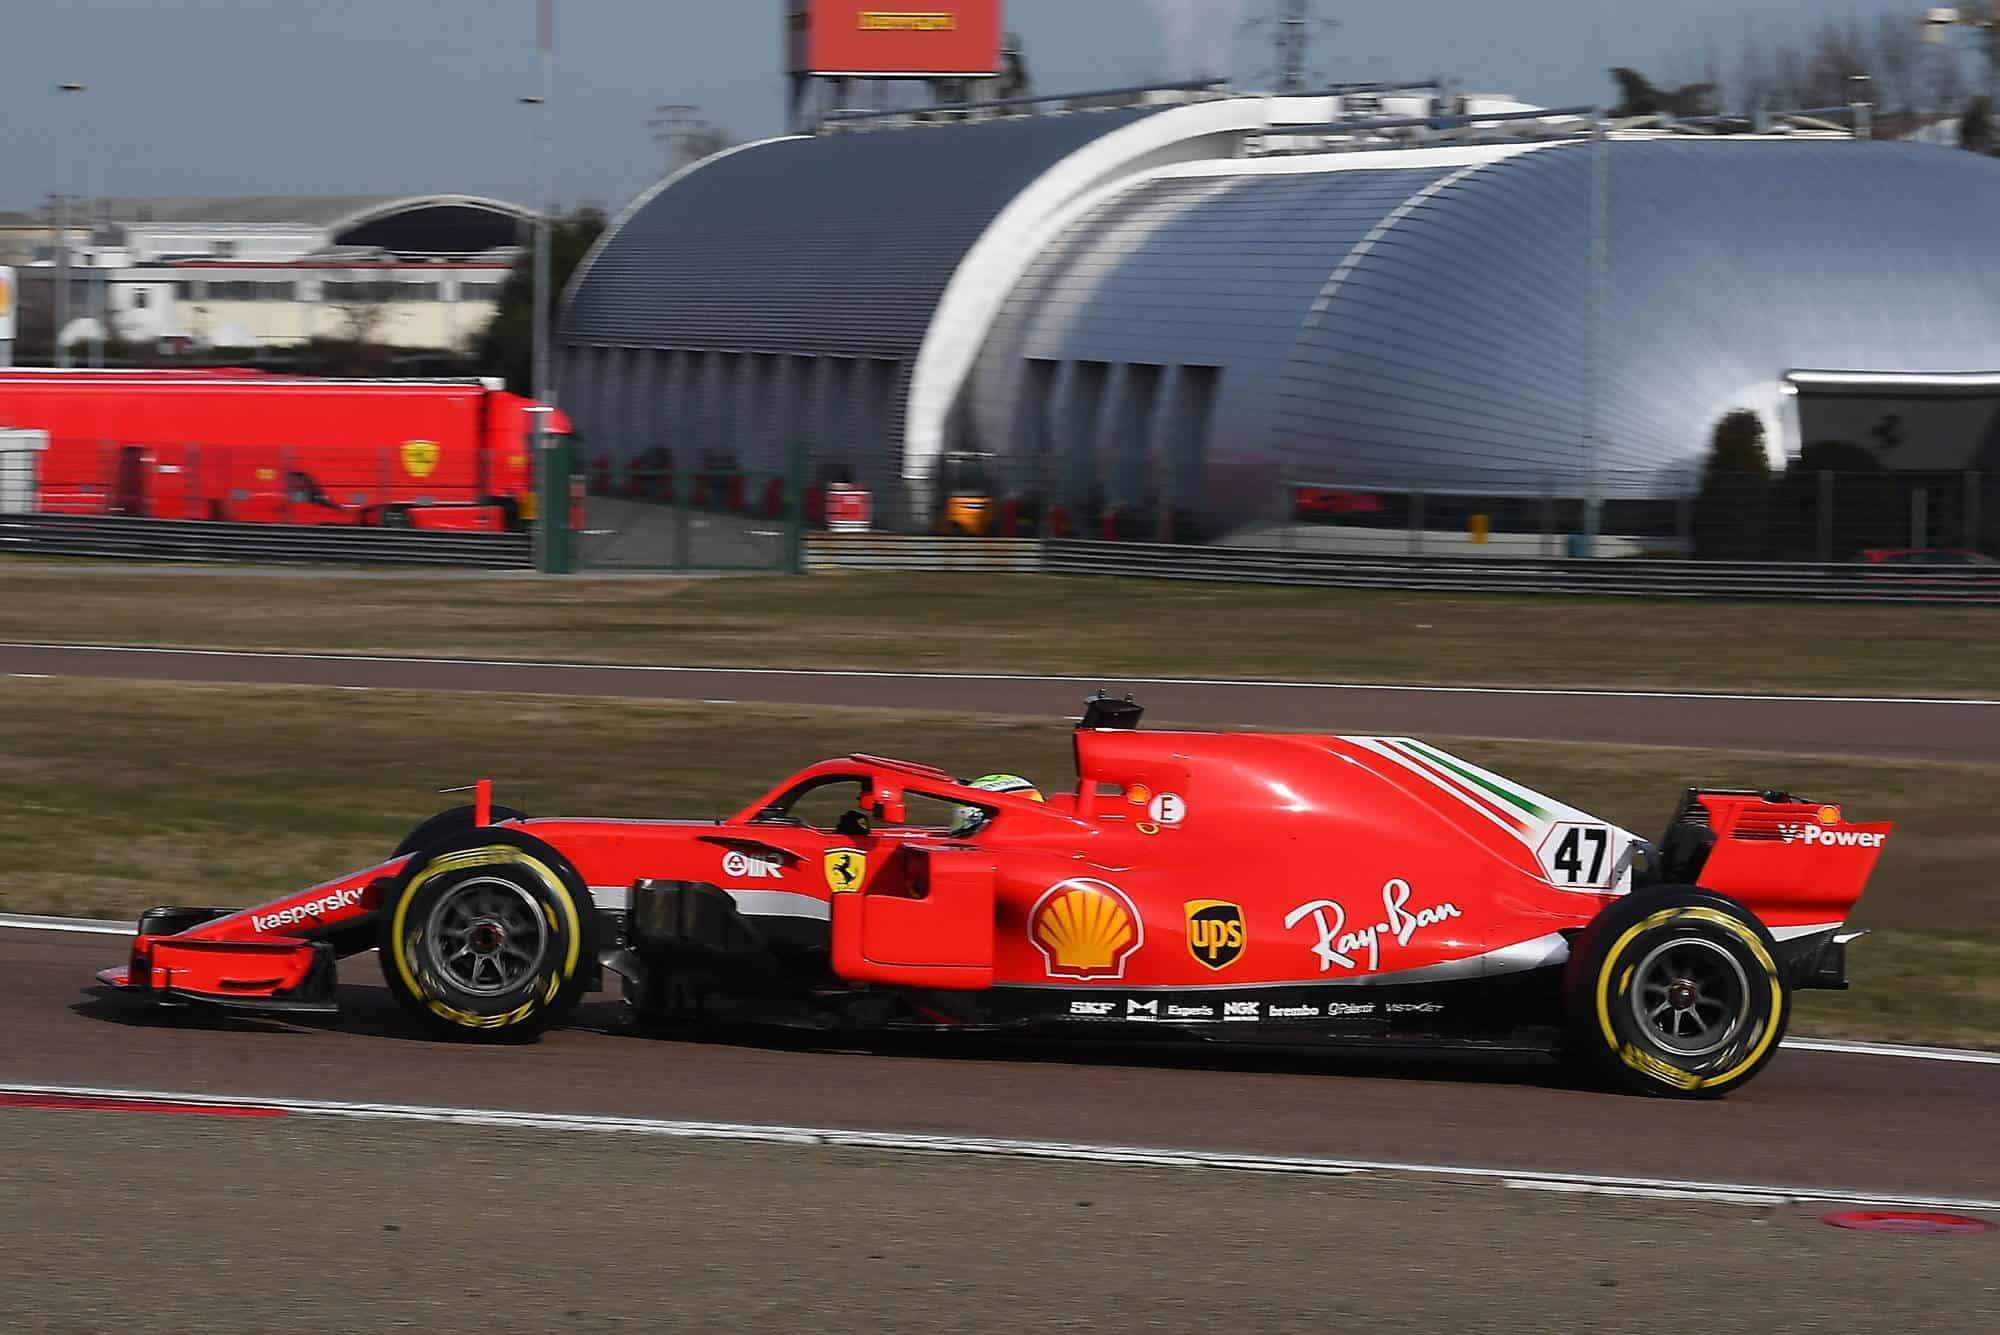 2021 Fiorano Mick Schumacher on track side view Fiorano Ferrari SF71H 2018 on Thu 28 Jan 2021 Photo Ferrari